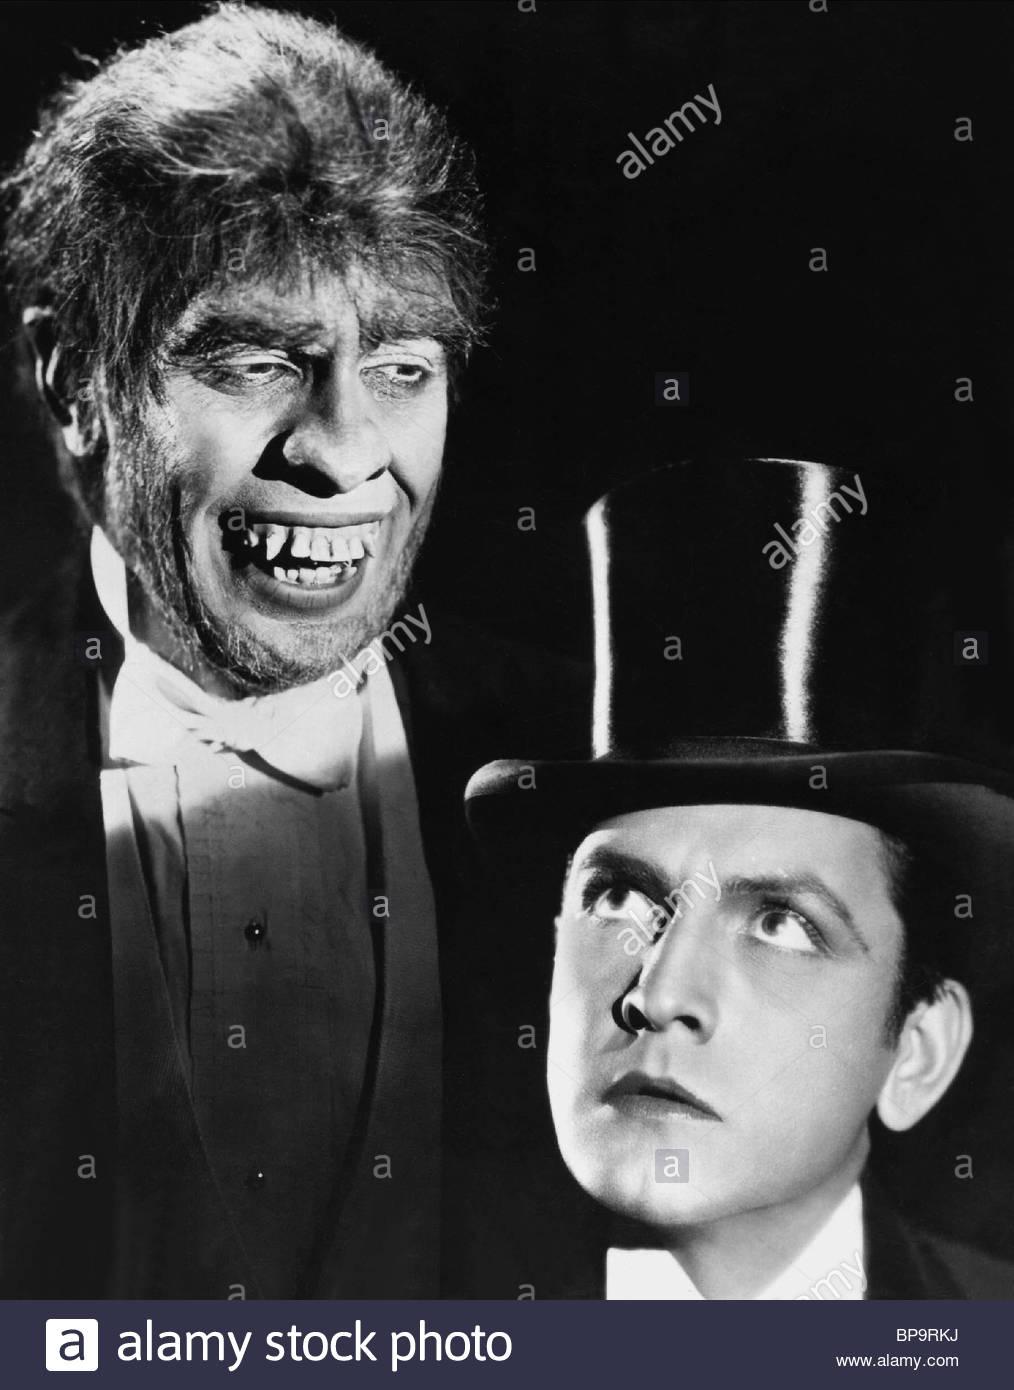 fredric-march-fredric-march-dr-jekyll-and-mr-hyde-1931-BP9RKJ